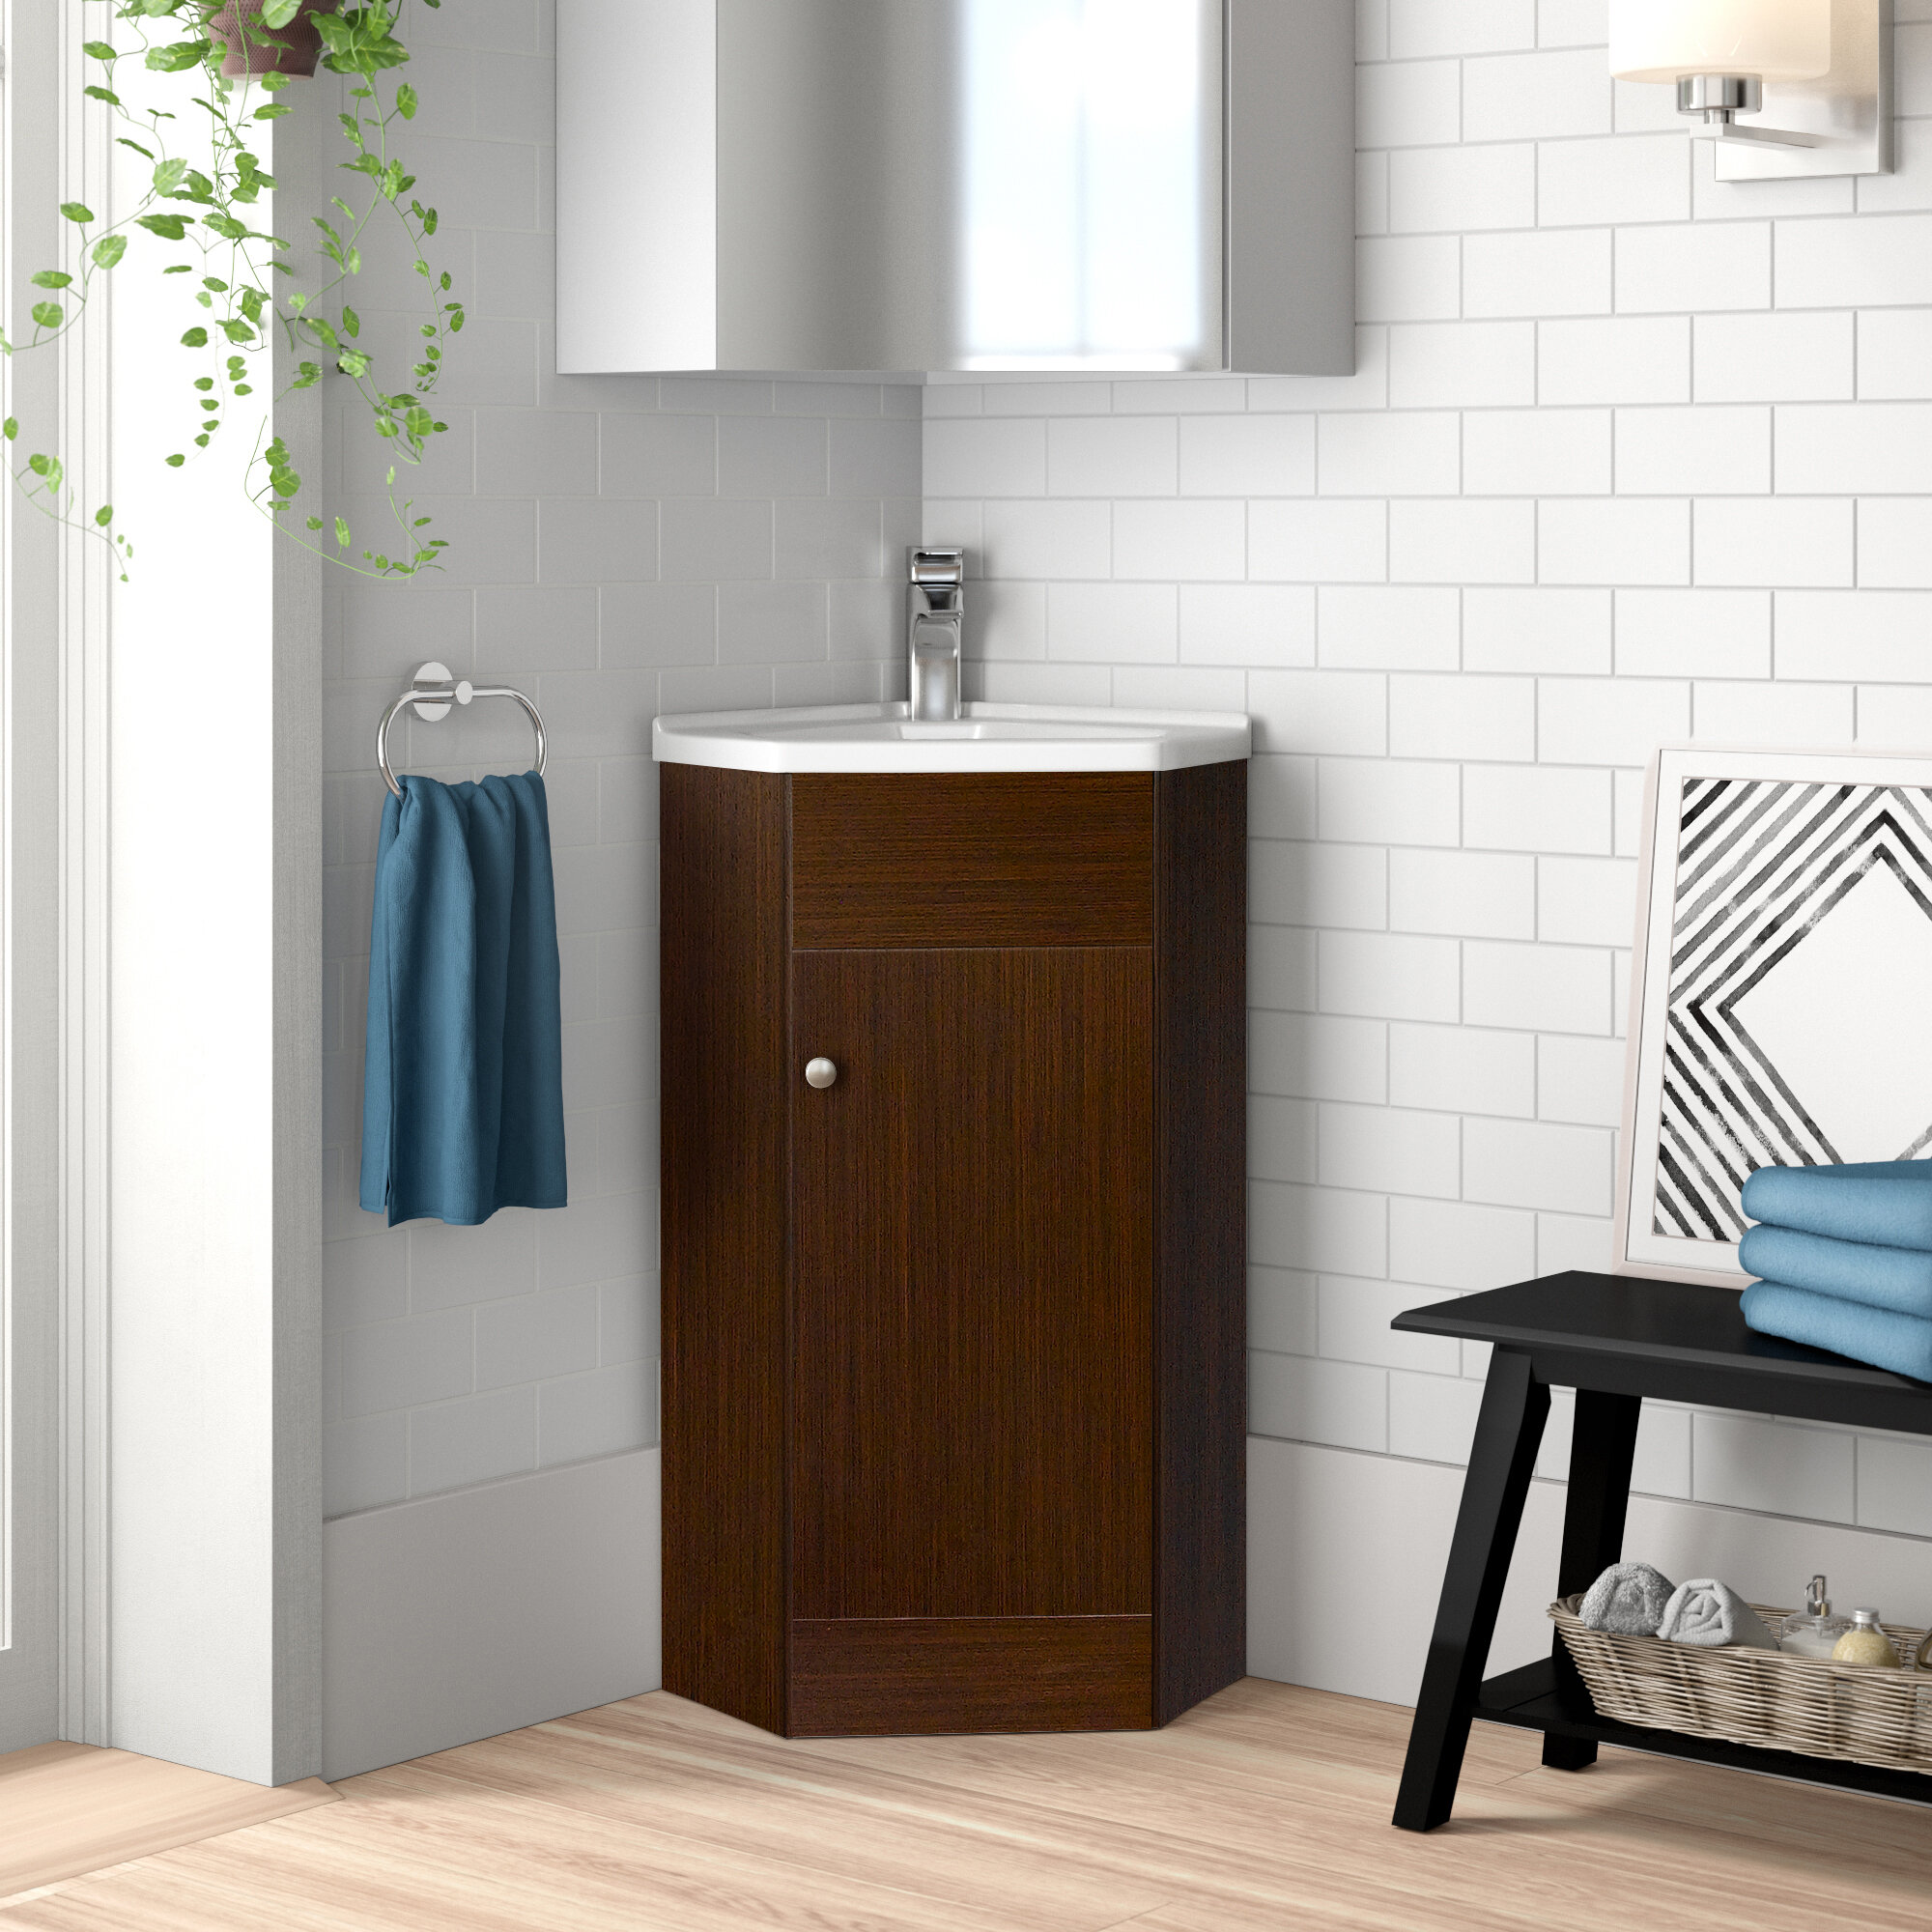 Corner Bathroom Vanities You Ll Love In 2021 Wayfair